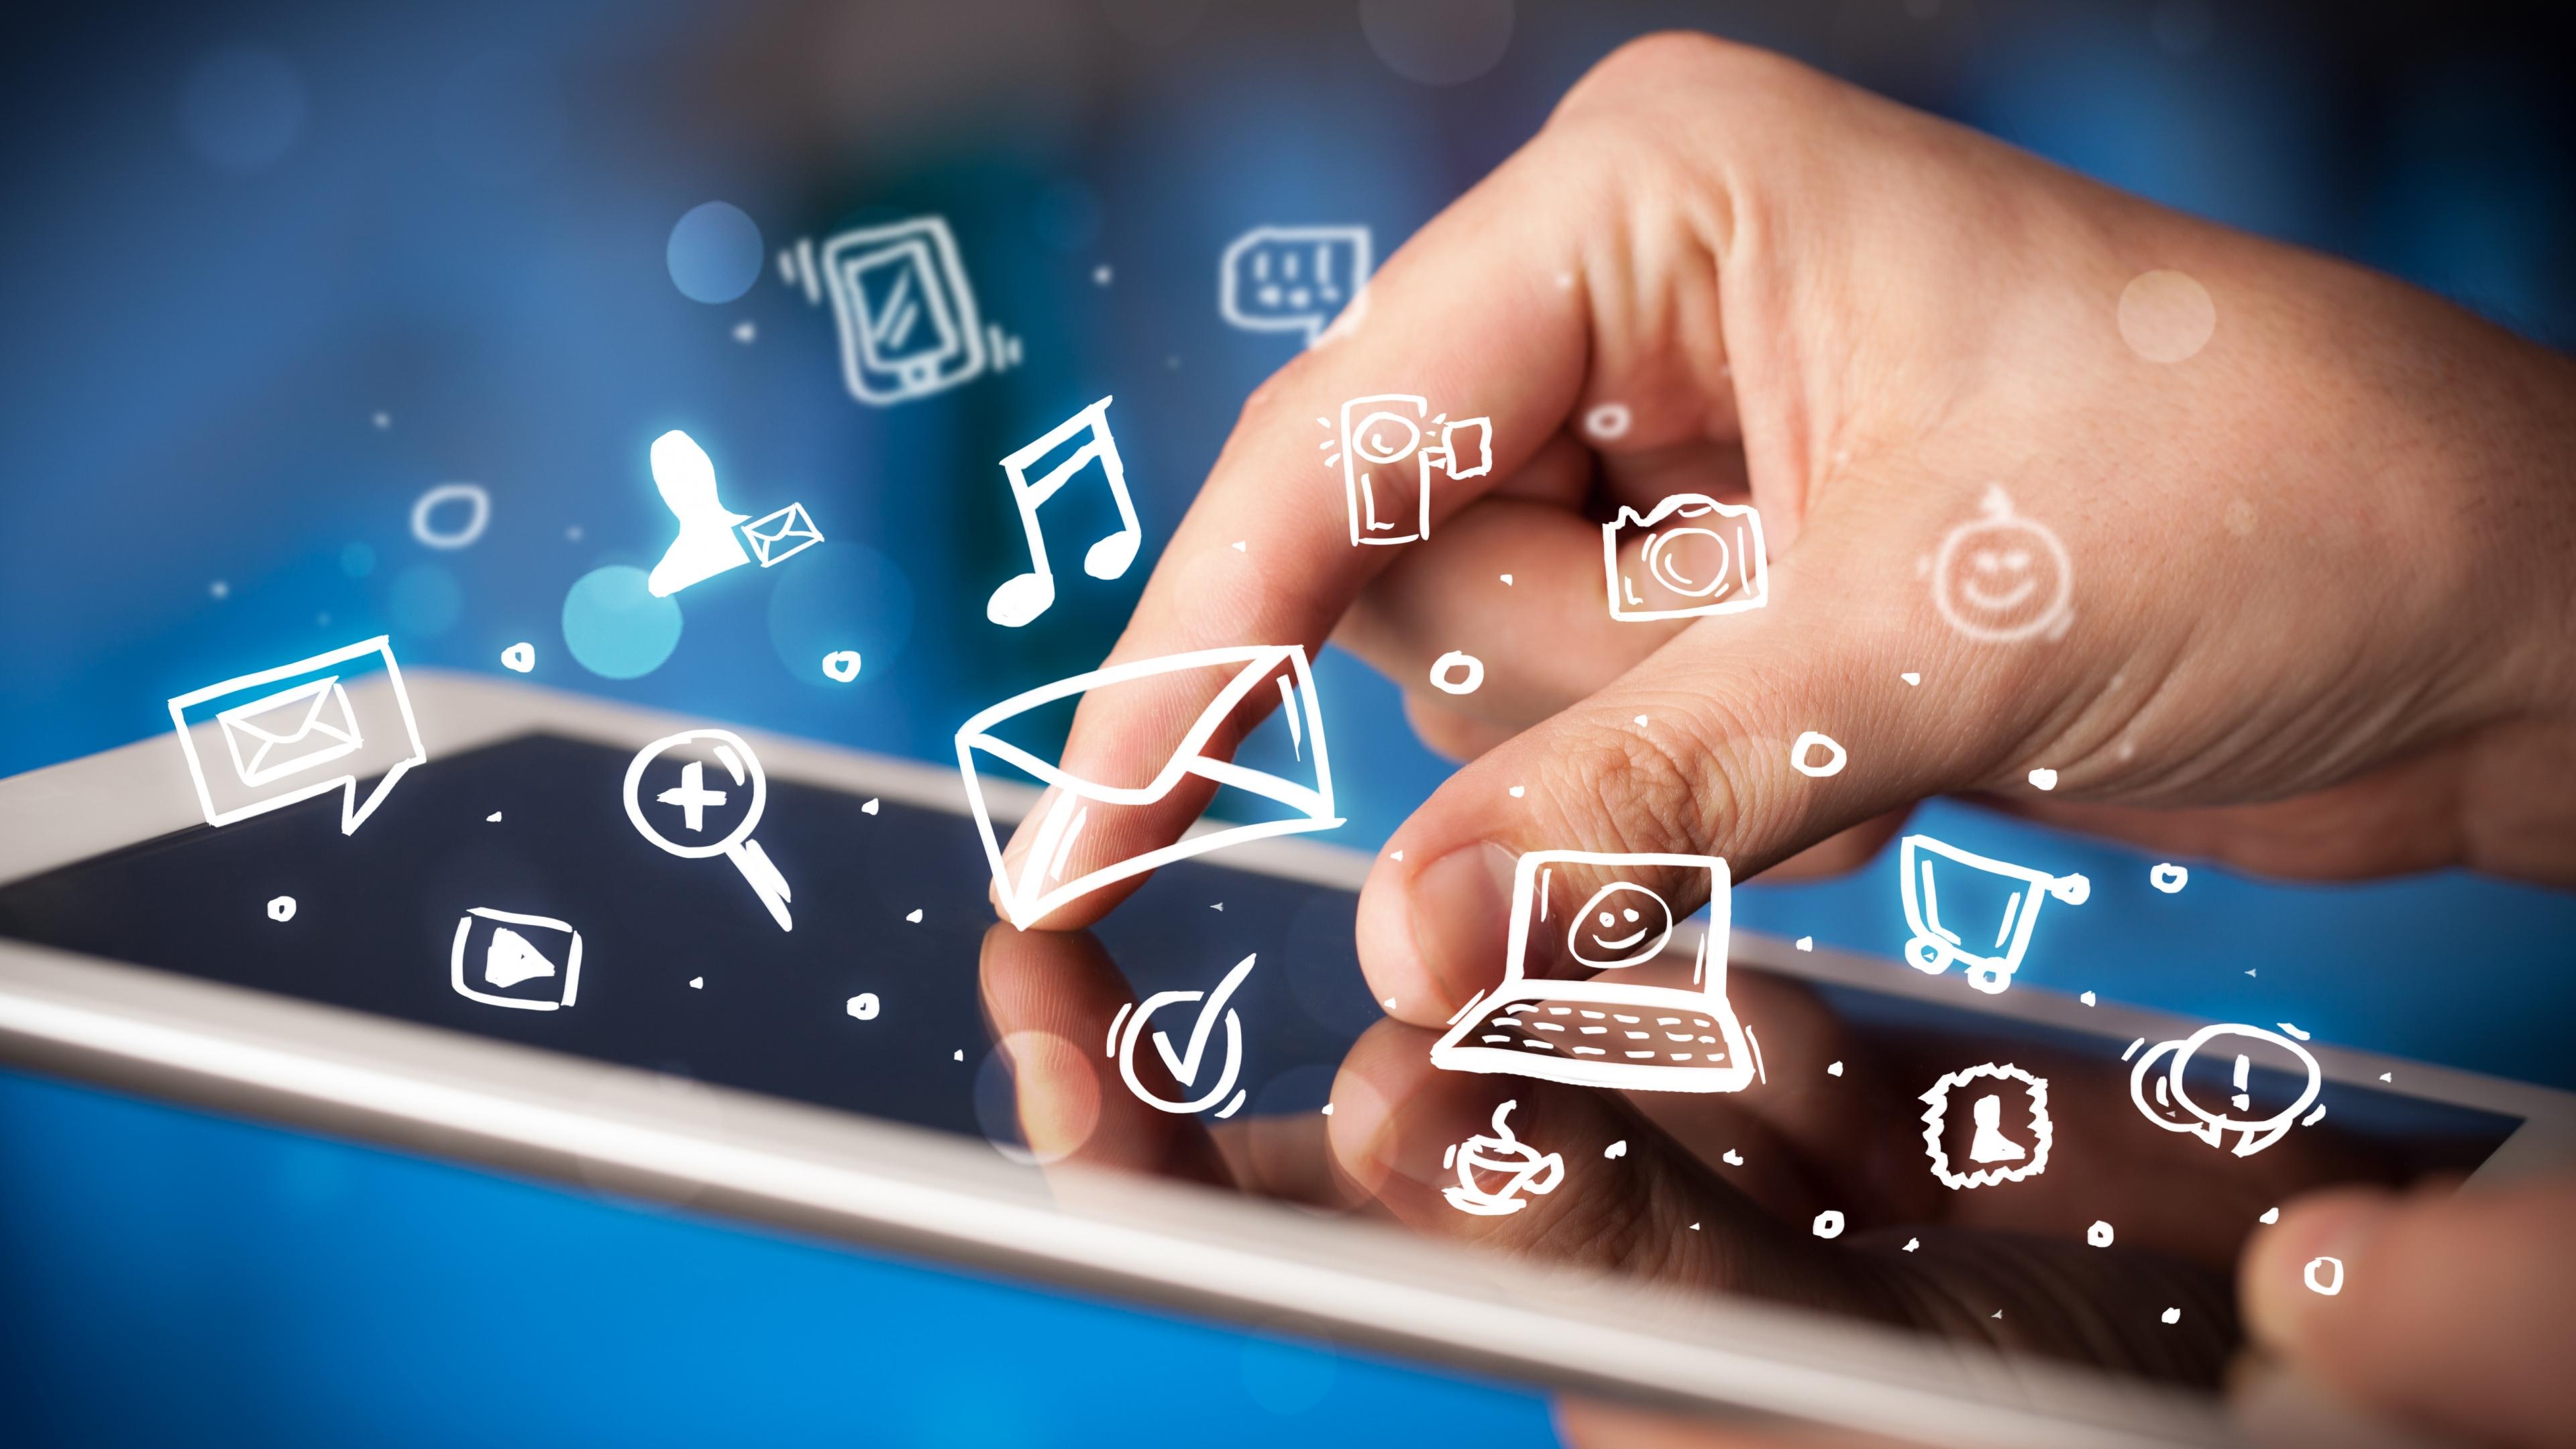 4k Ultra Hd Hi Tech Wallpapers Desktop Backgrounds Mobile Technology 3840x2160 Wallpaper Teahub Io